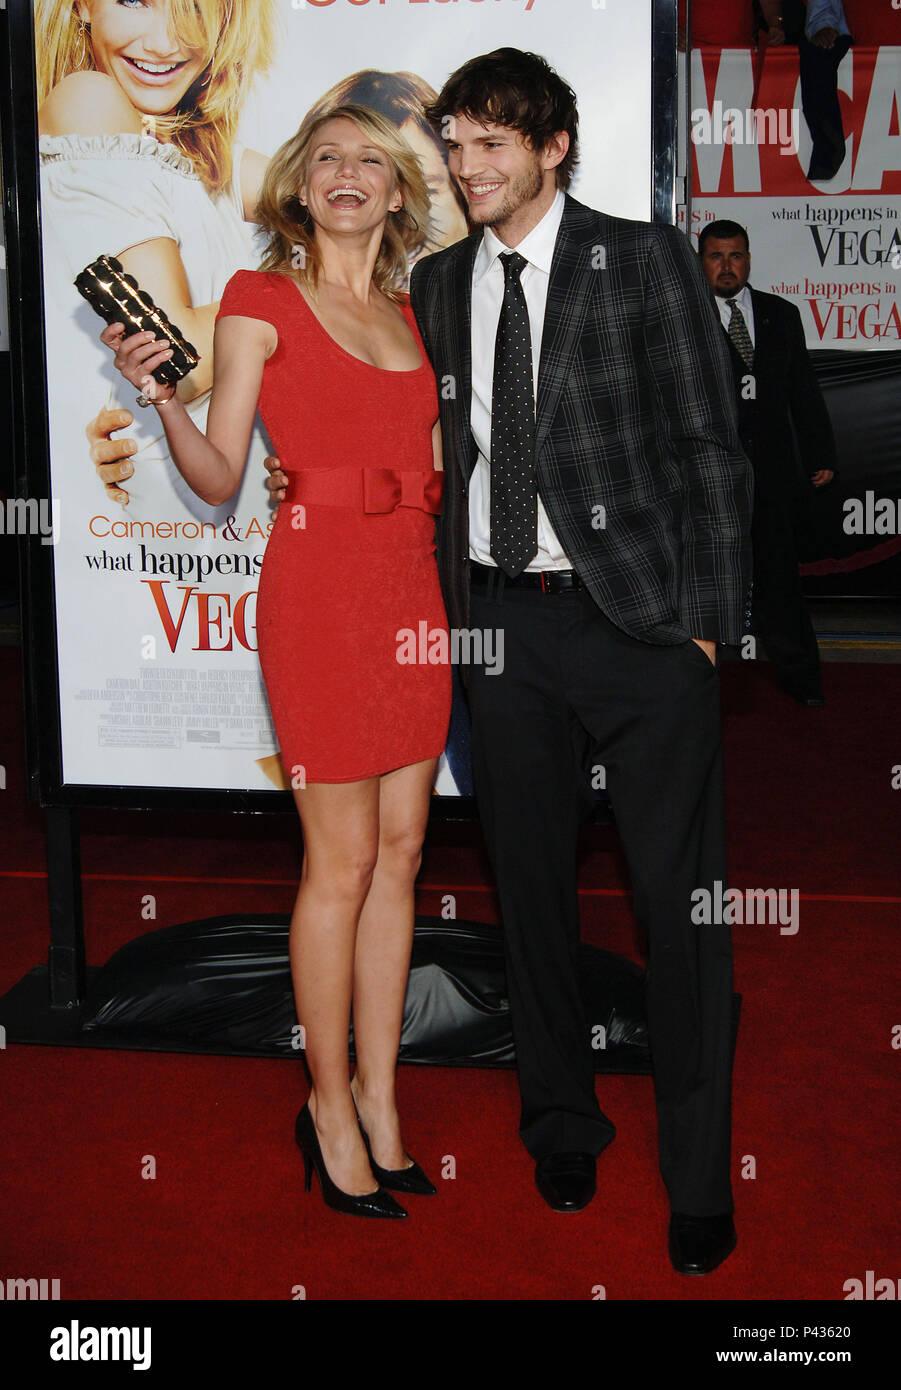 Ashton Kutcher Cameron Diaz What Happens In Vegas Premiere At